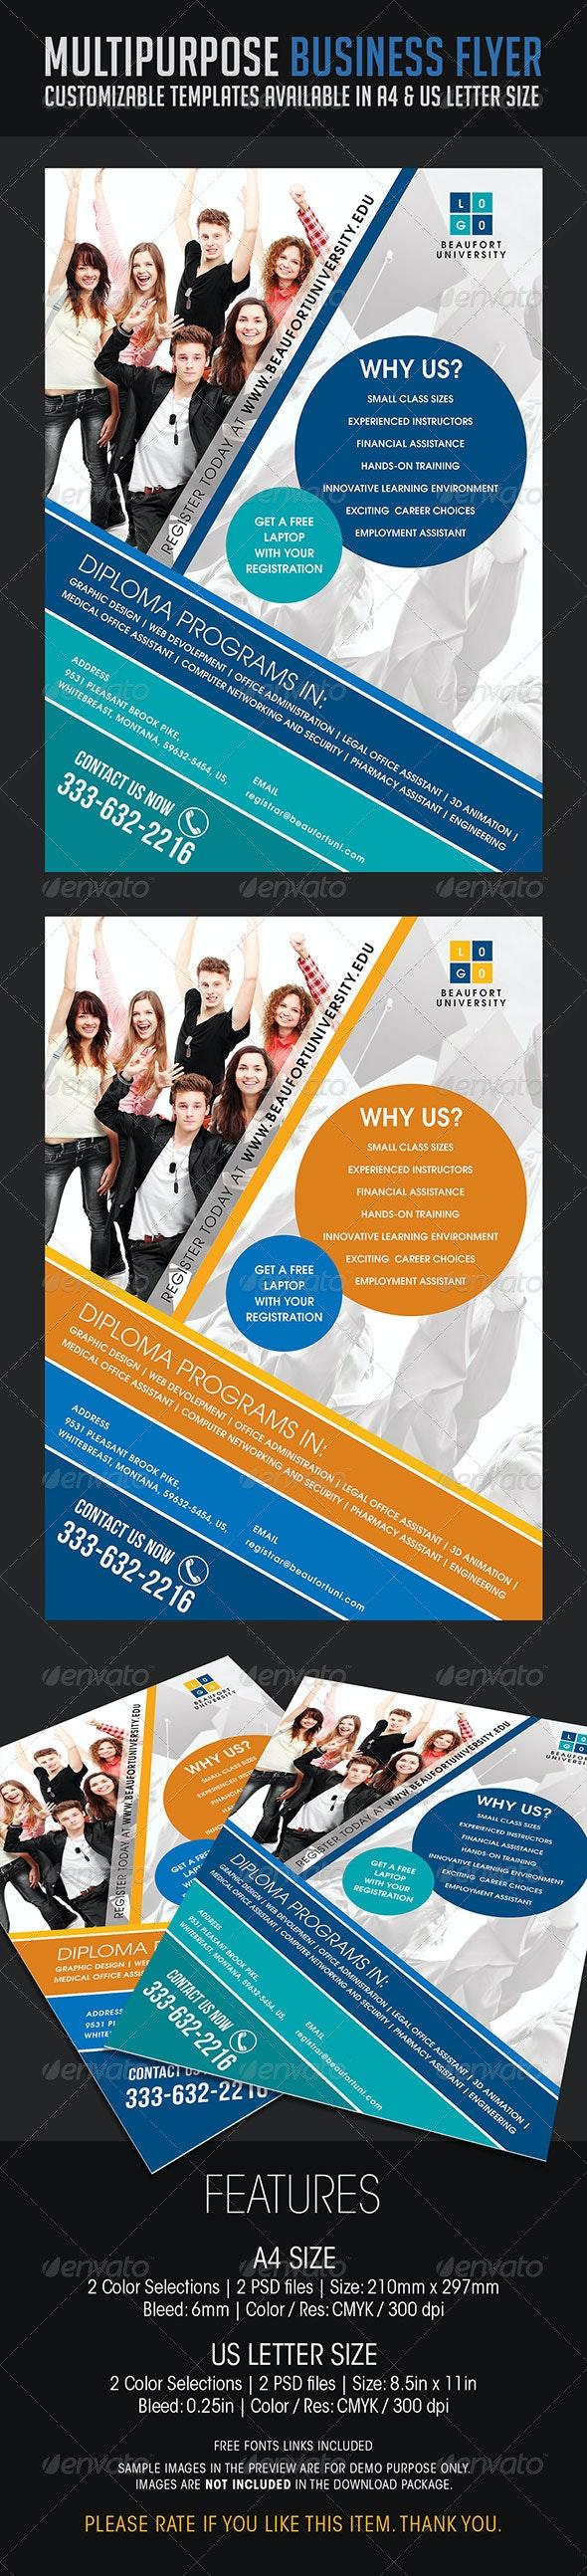 Multipurpose Business Flyer 09 - Flyers Print Templates